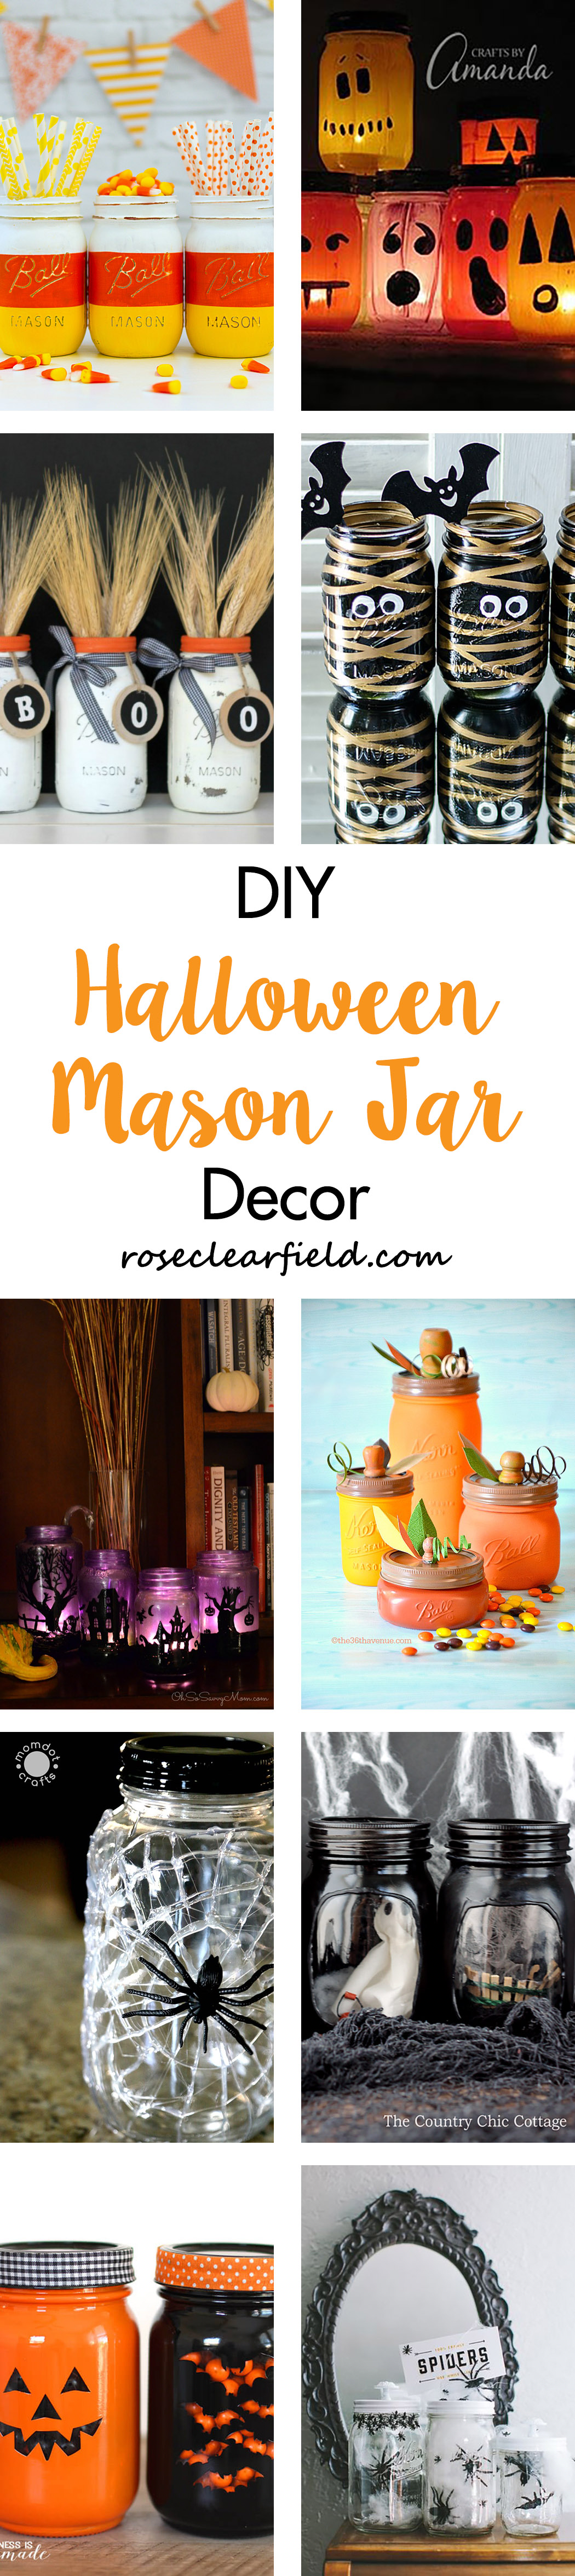 DIY Halloween Mason Jar Decor | https://www.roseclearfield.com